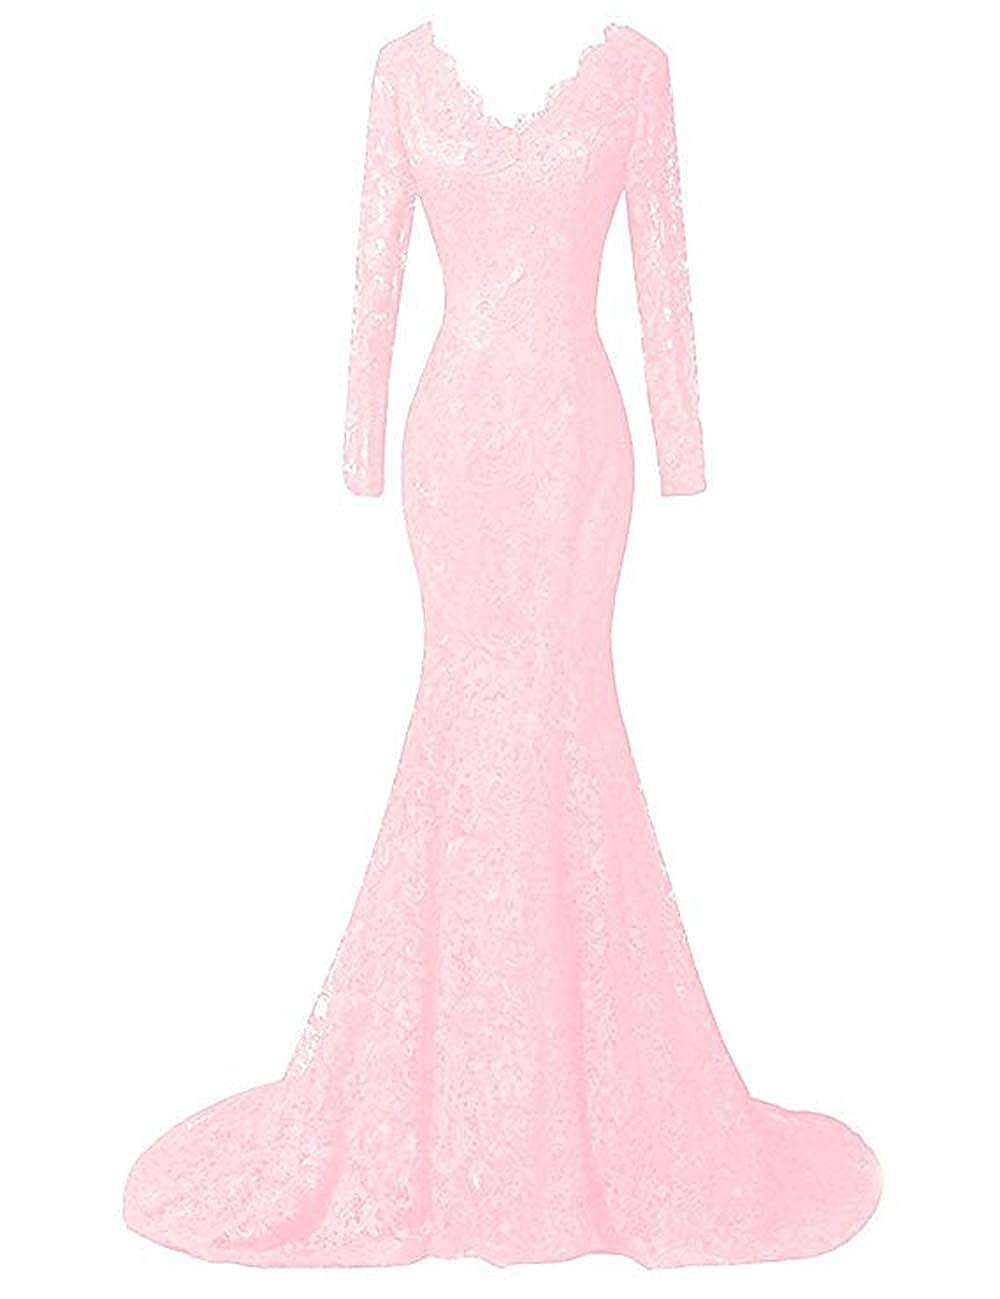 blueshing Pink Ri Yun Women's Elegant Long Sleeves Lace Prom Dresses Mermaid VNeck Beaded Formal Evening Party Gowns